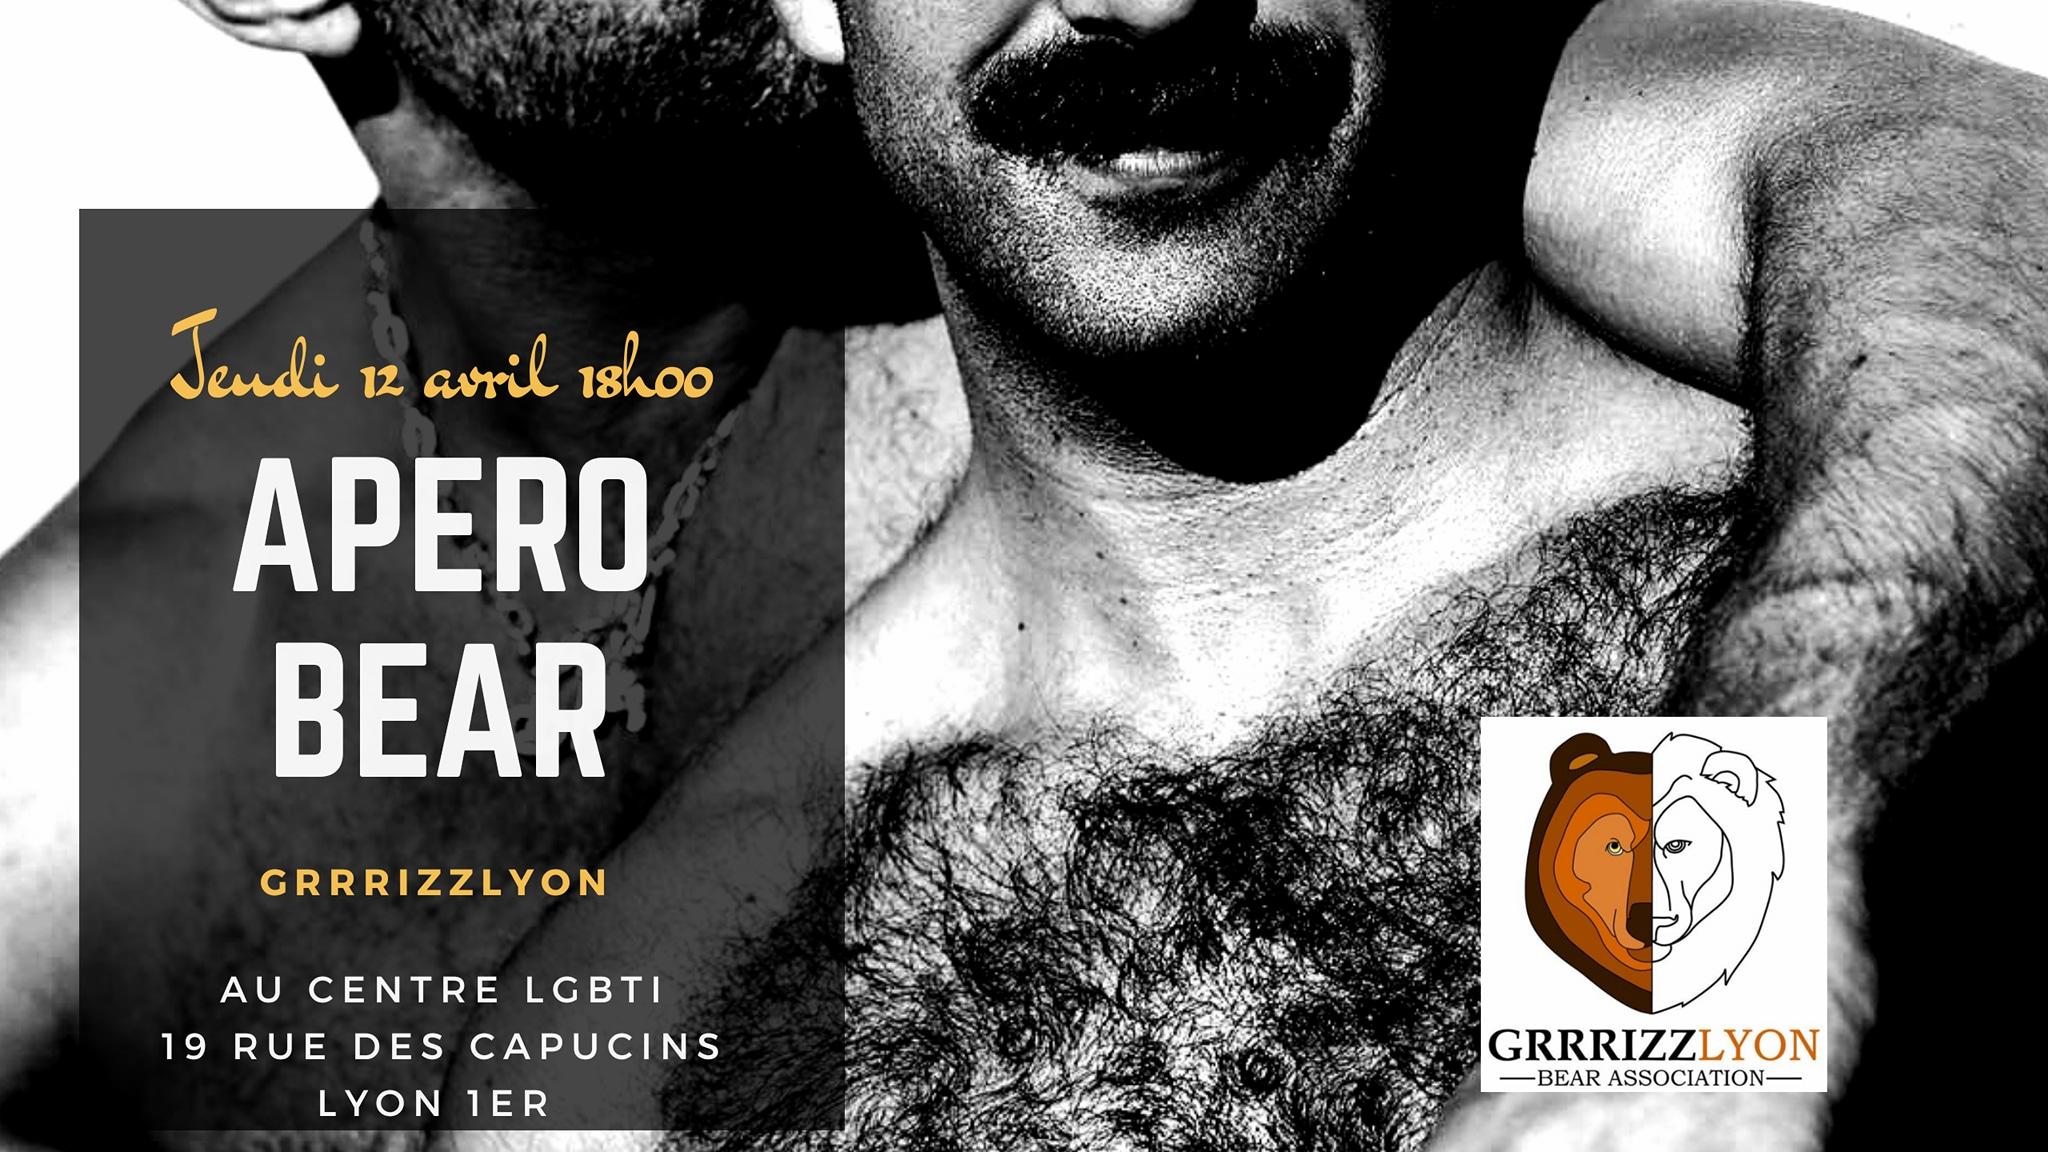 Apéro BEAR, jeudi 12 avril, 18h, Centre LGBTI